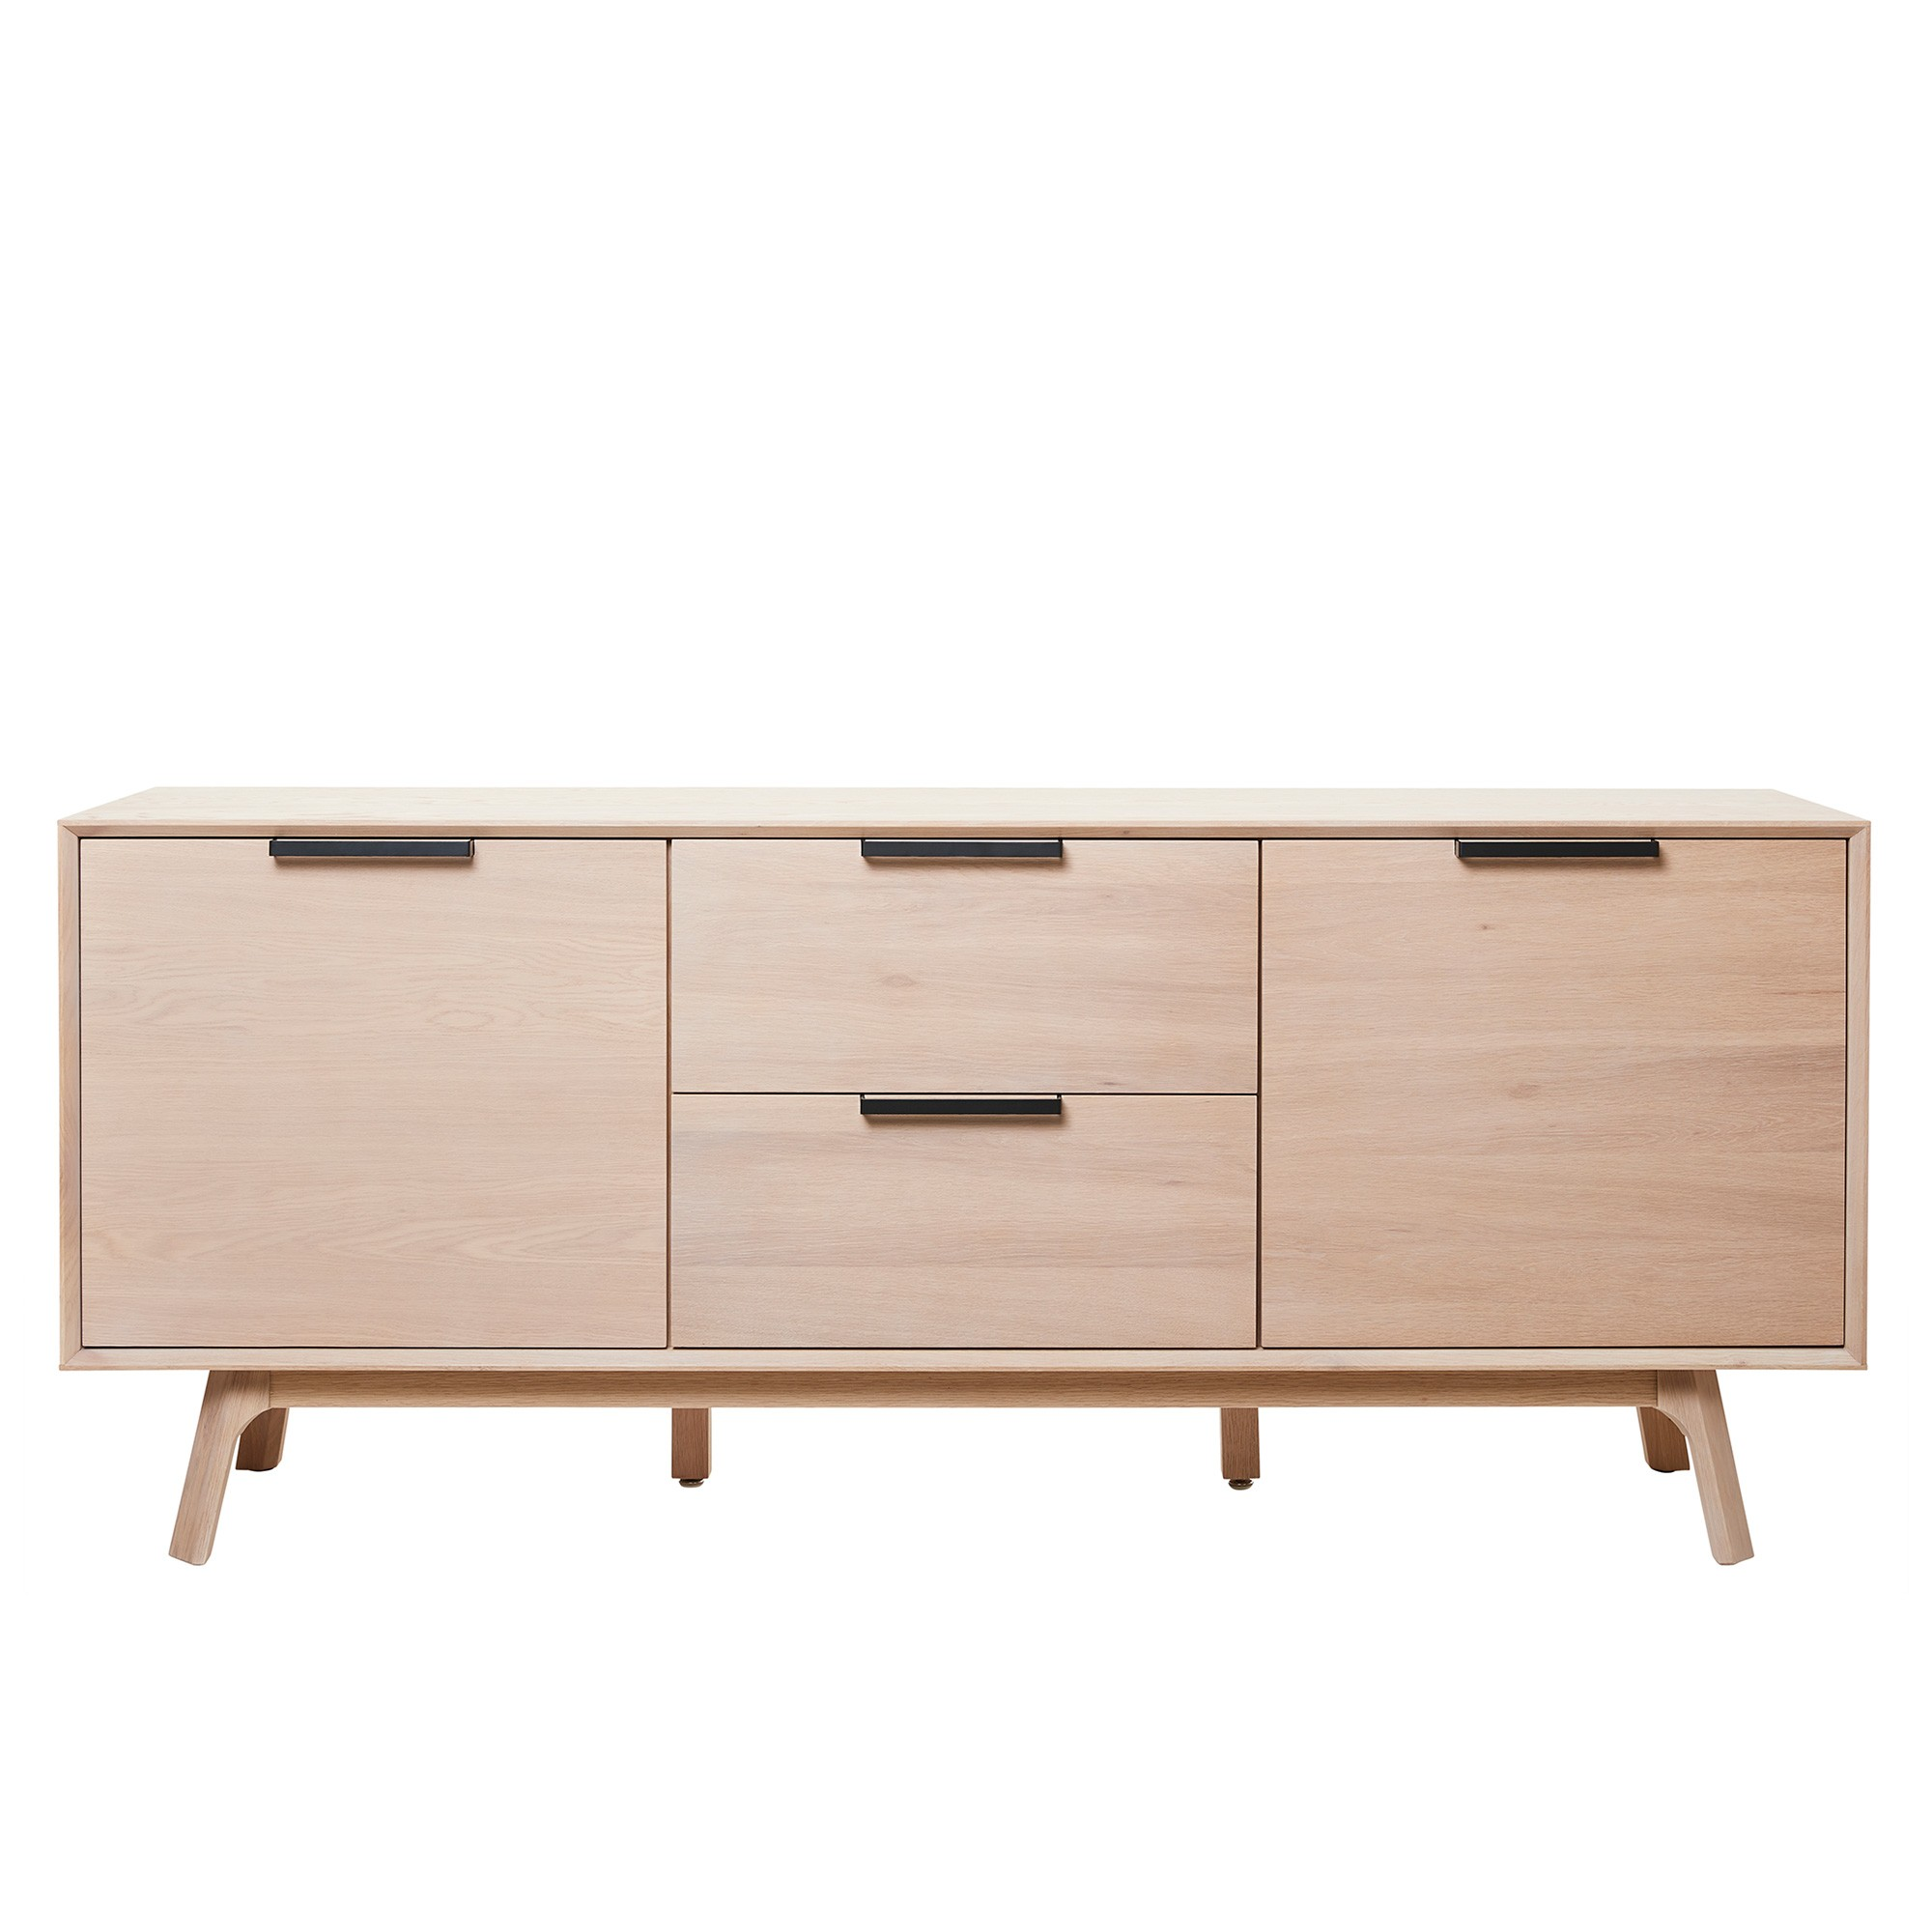 Capri White Oak Timber 2 Door 2 Drawer Sideboard, 180cm